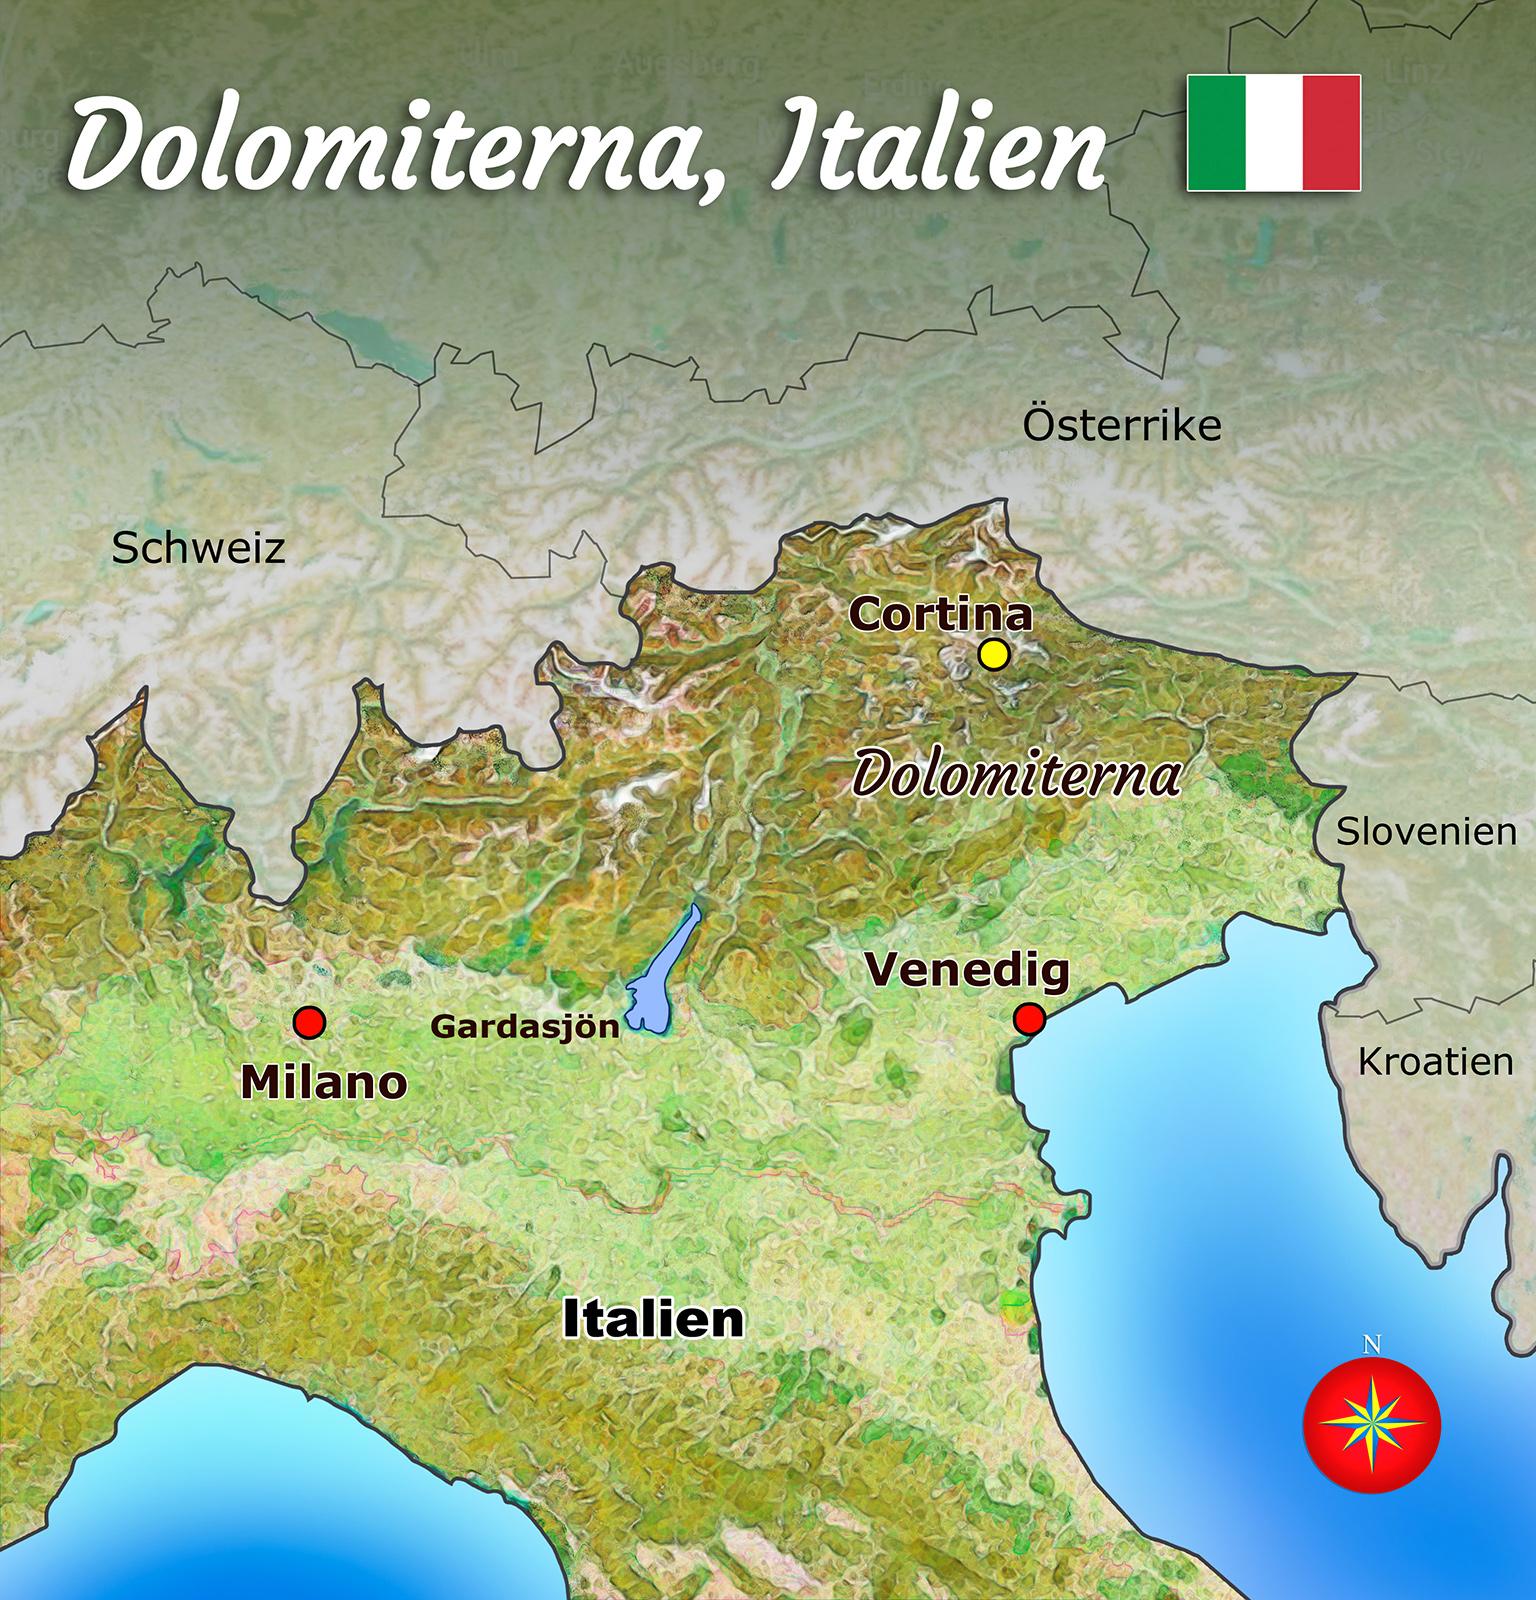 dolomiterna italien karta Cortina   Vandramera   Vandringsresor dolomiterna italien karta